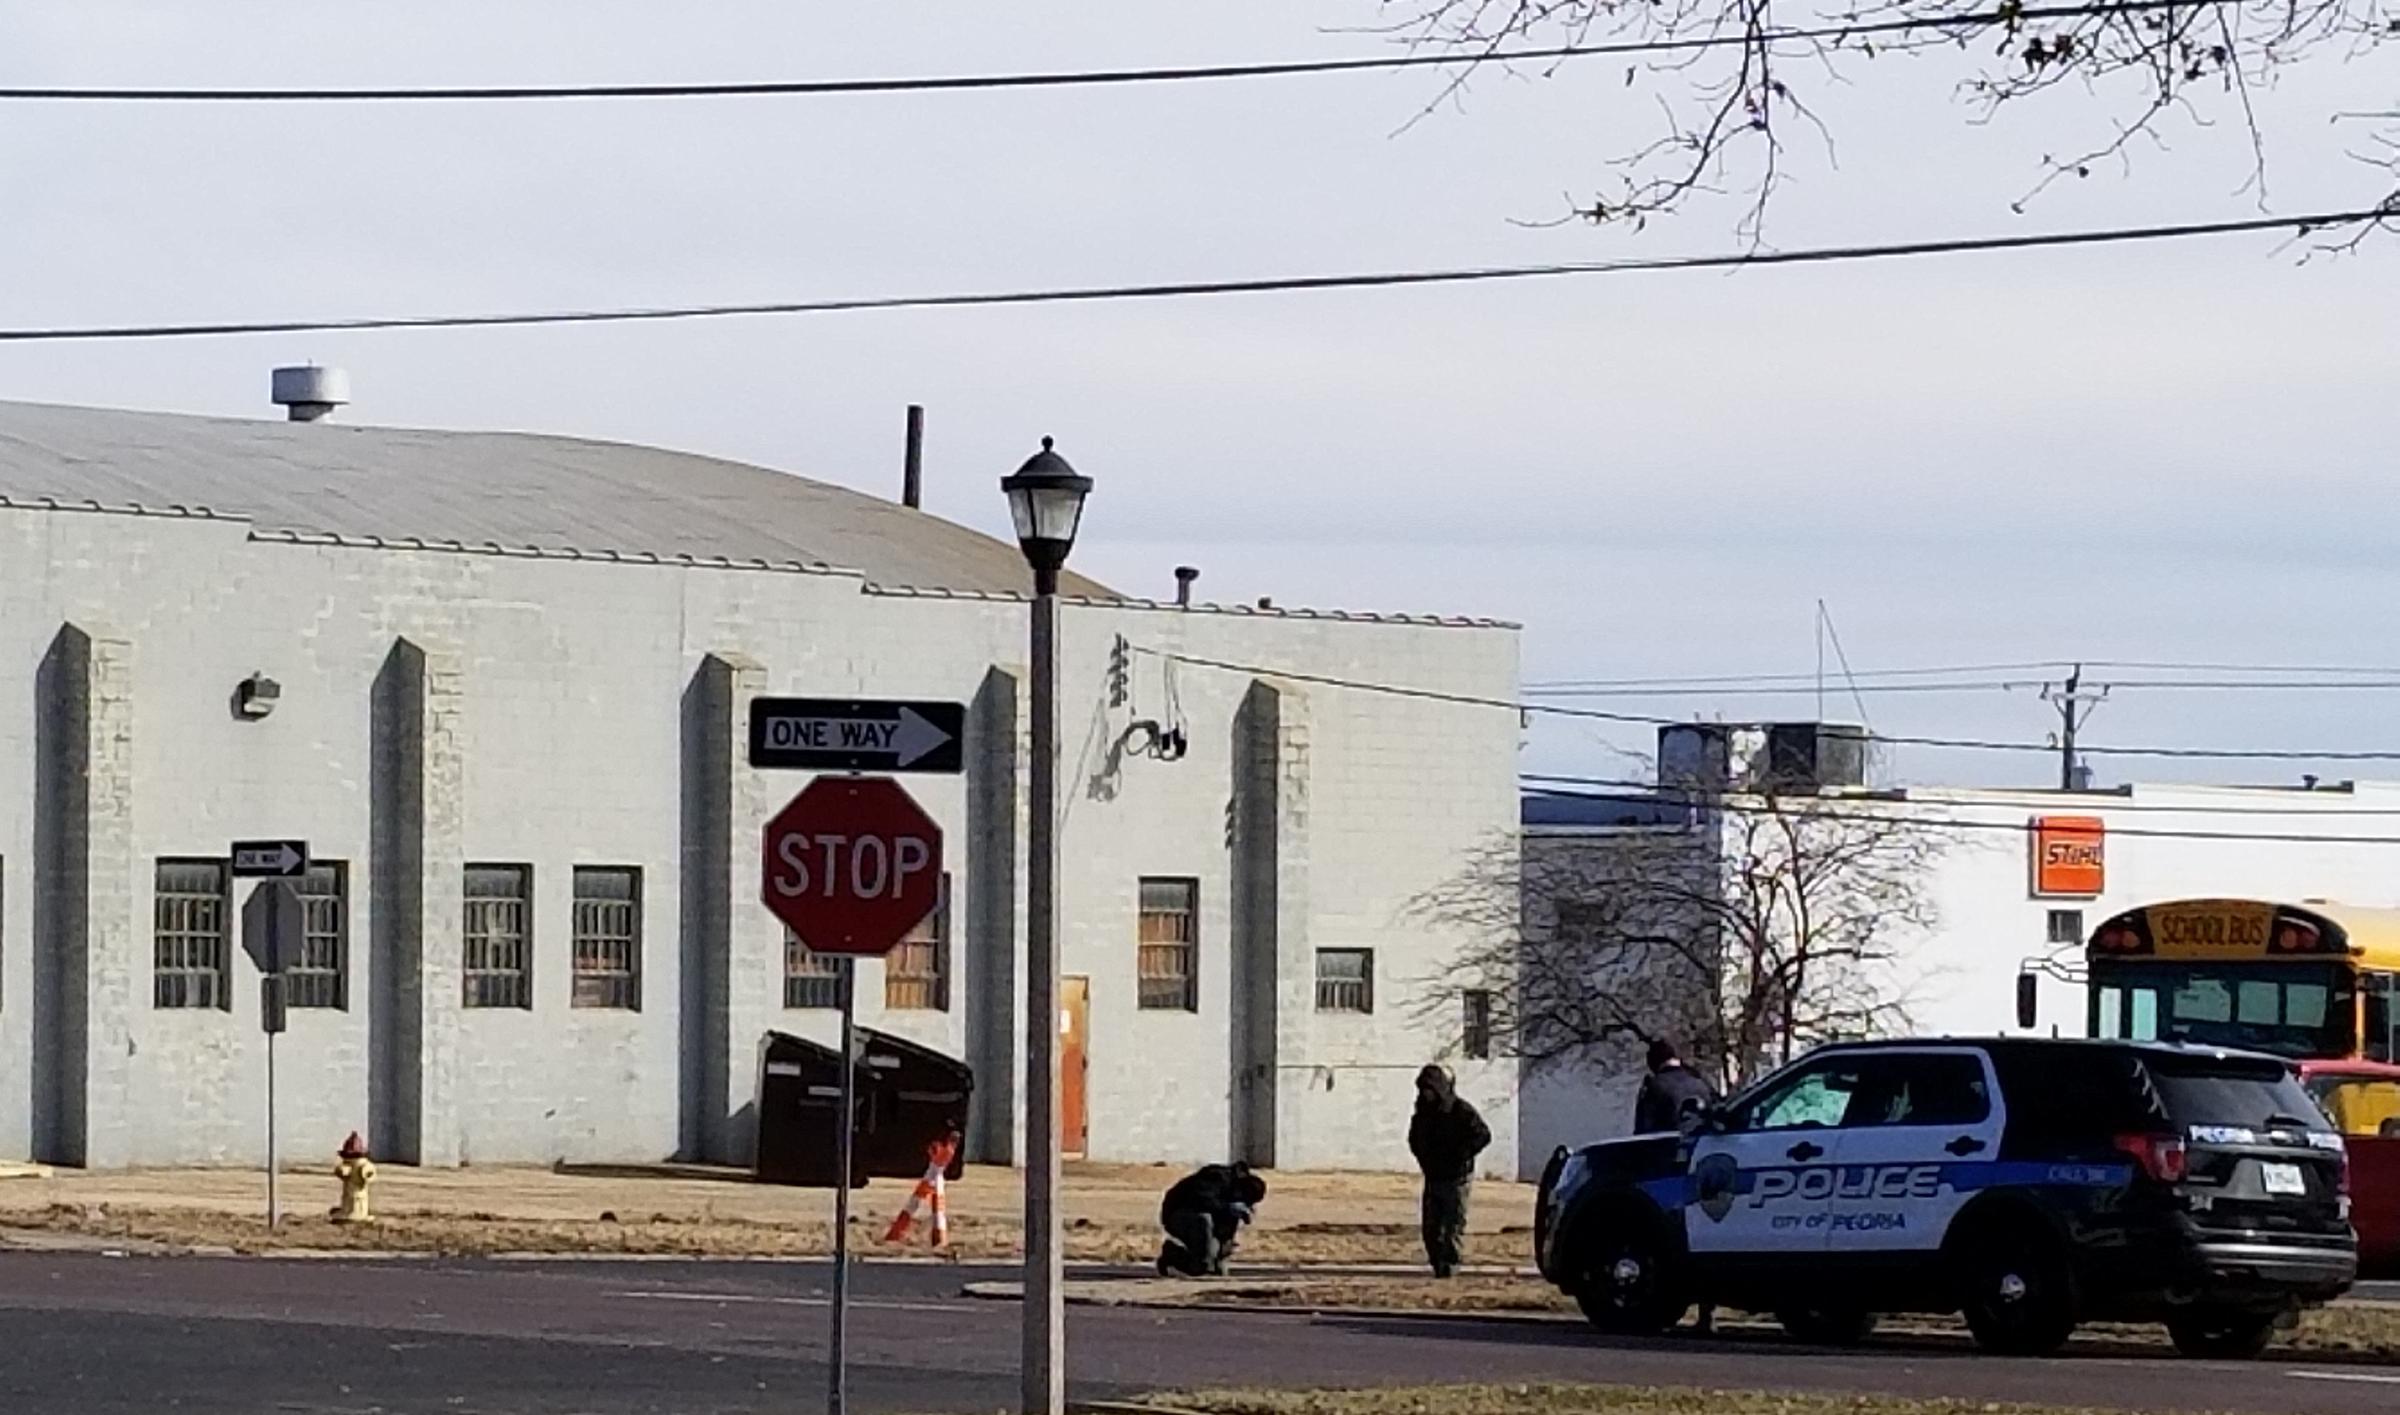 peoria police involved in fatal shooting peoria public radio